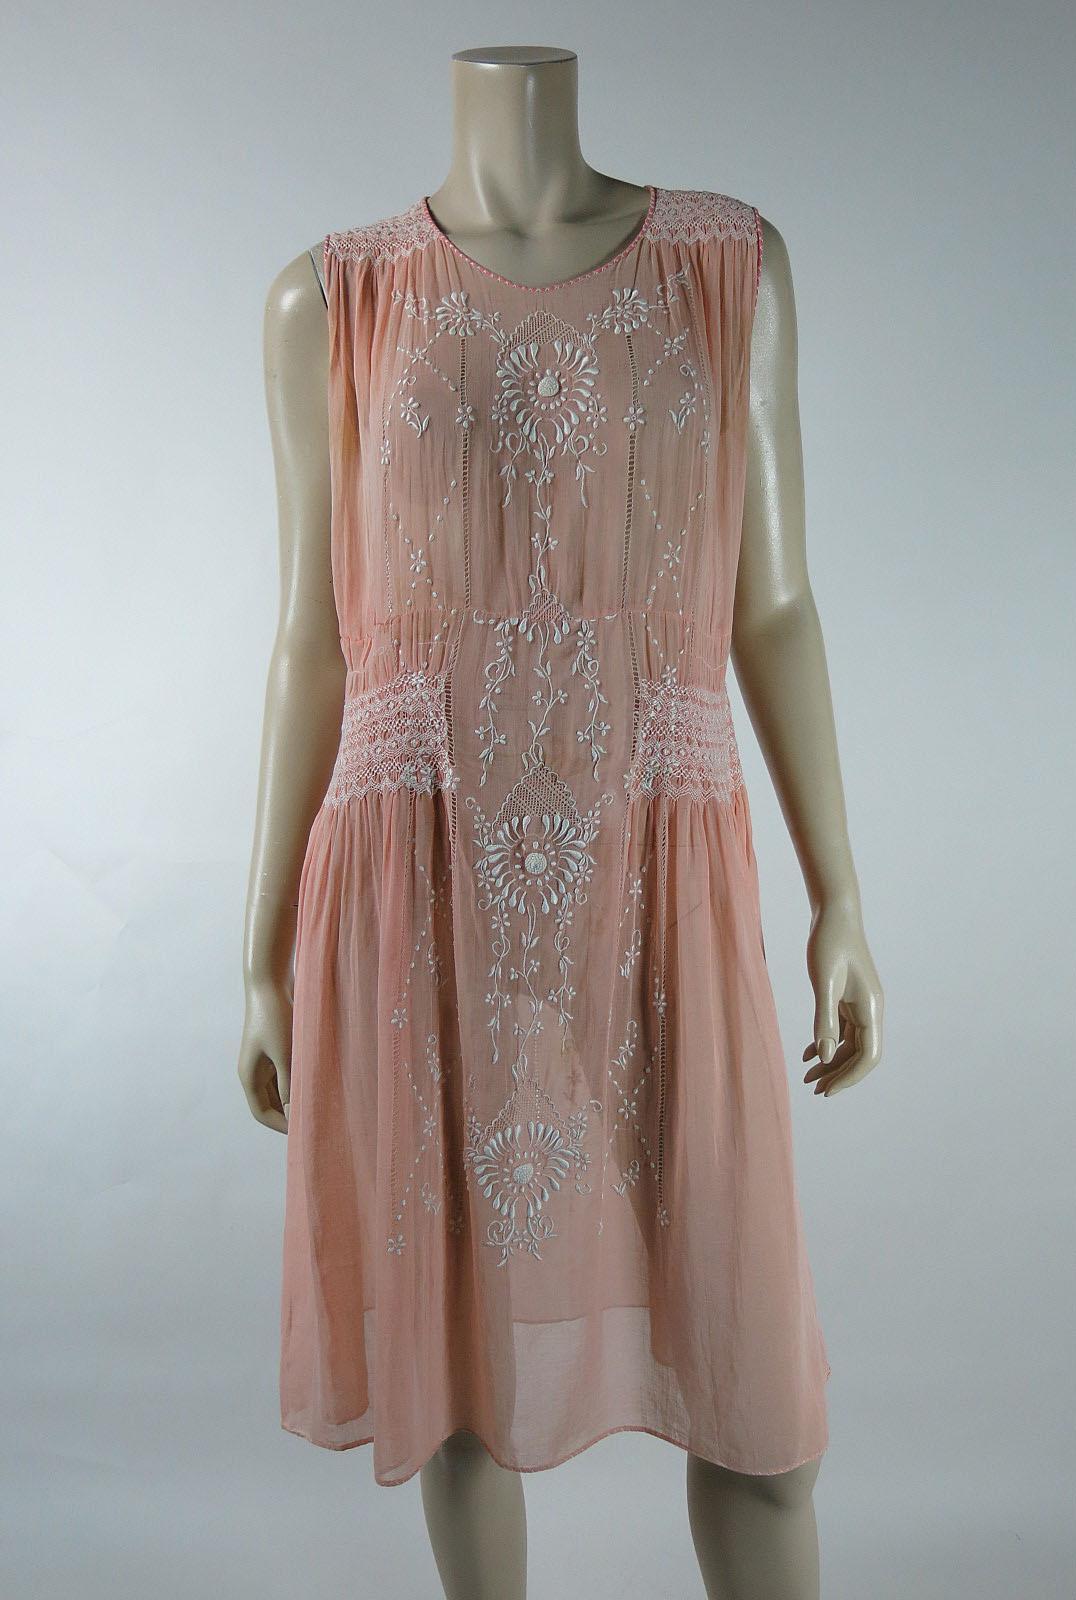 1920 Style Dresses